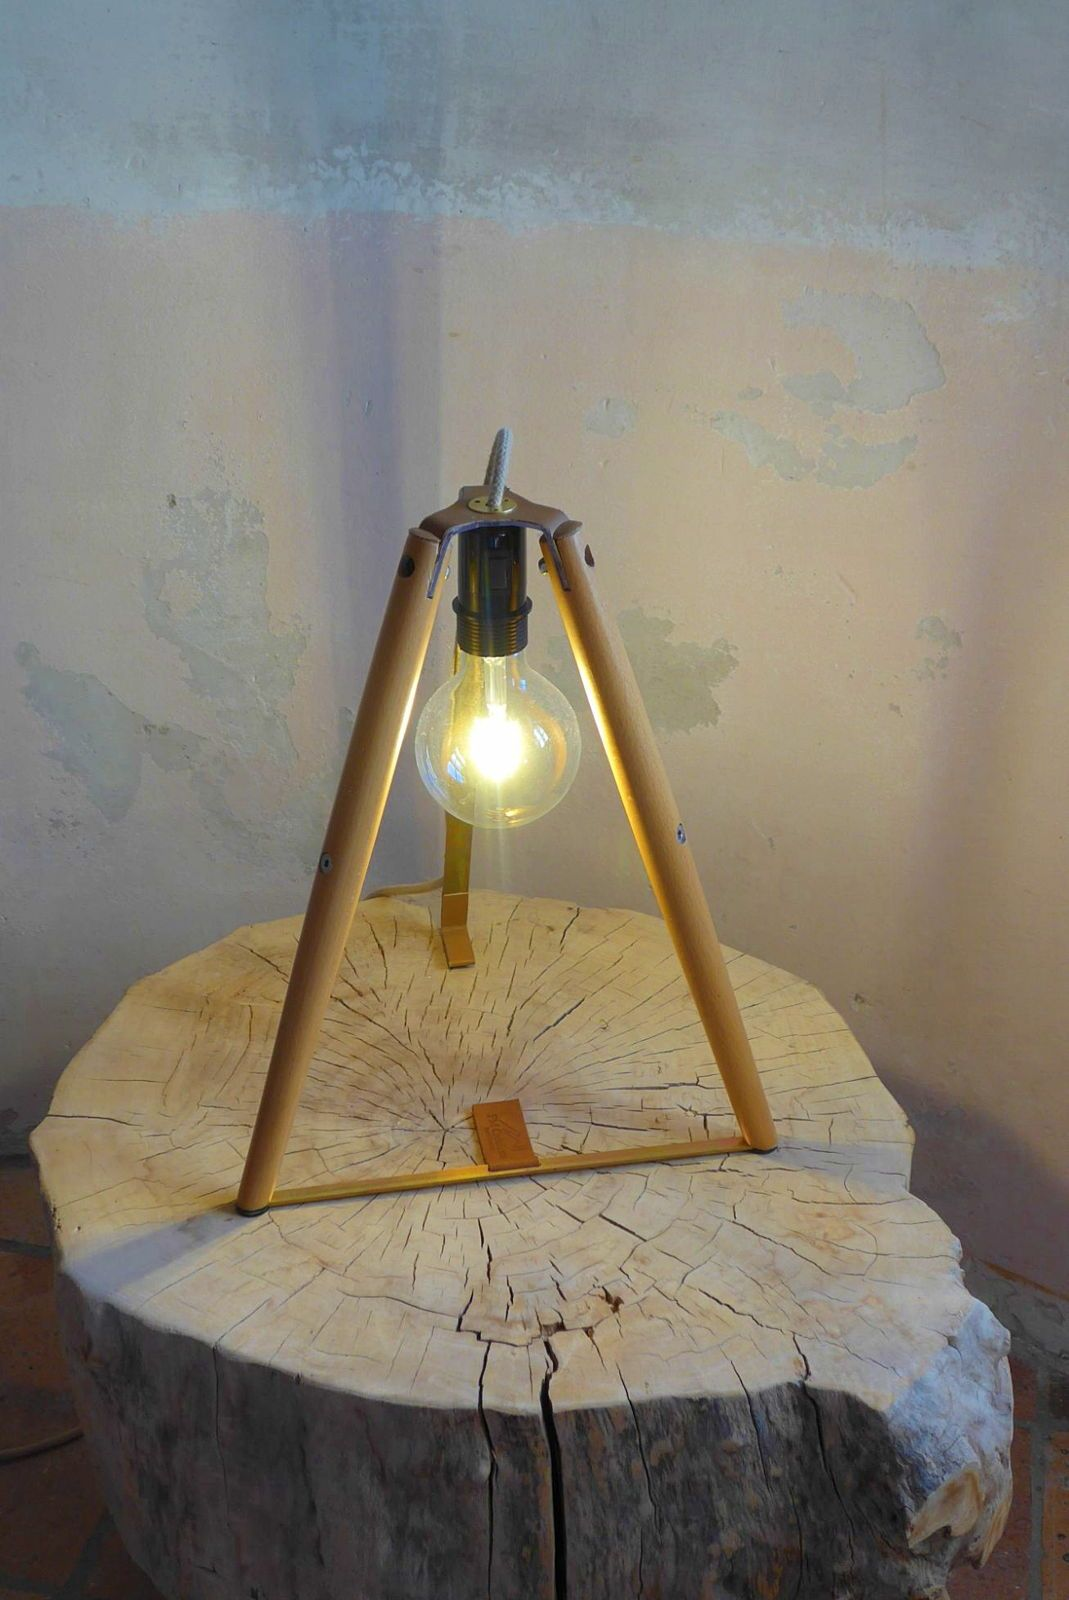 Vends lampe création artisanale